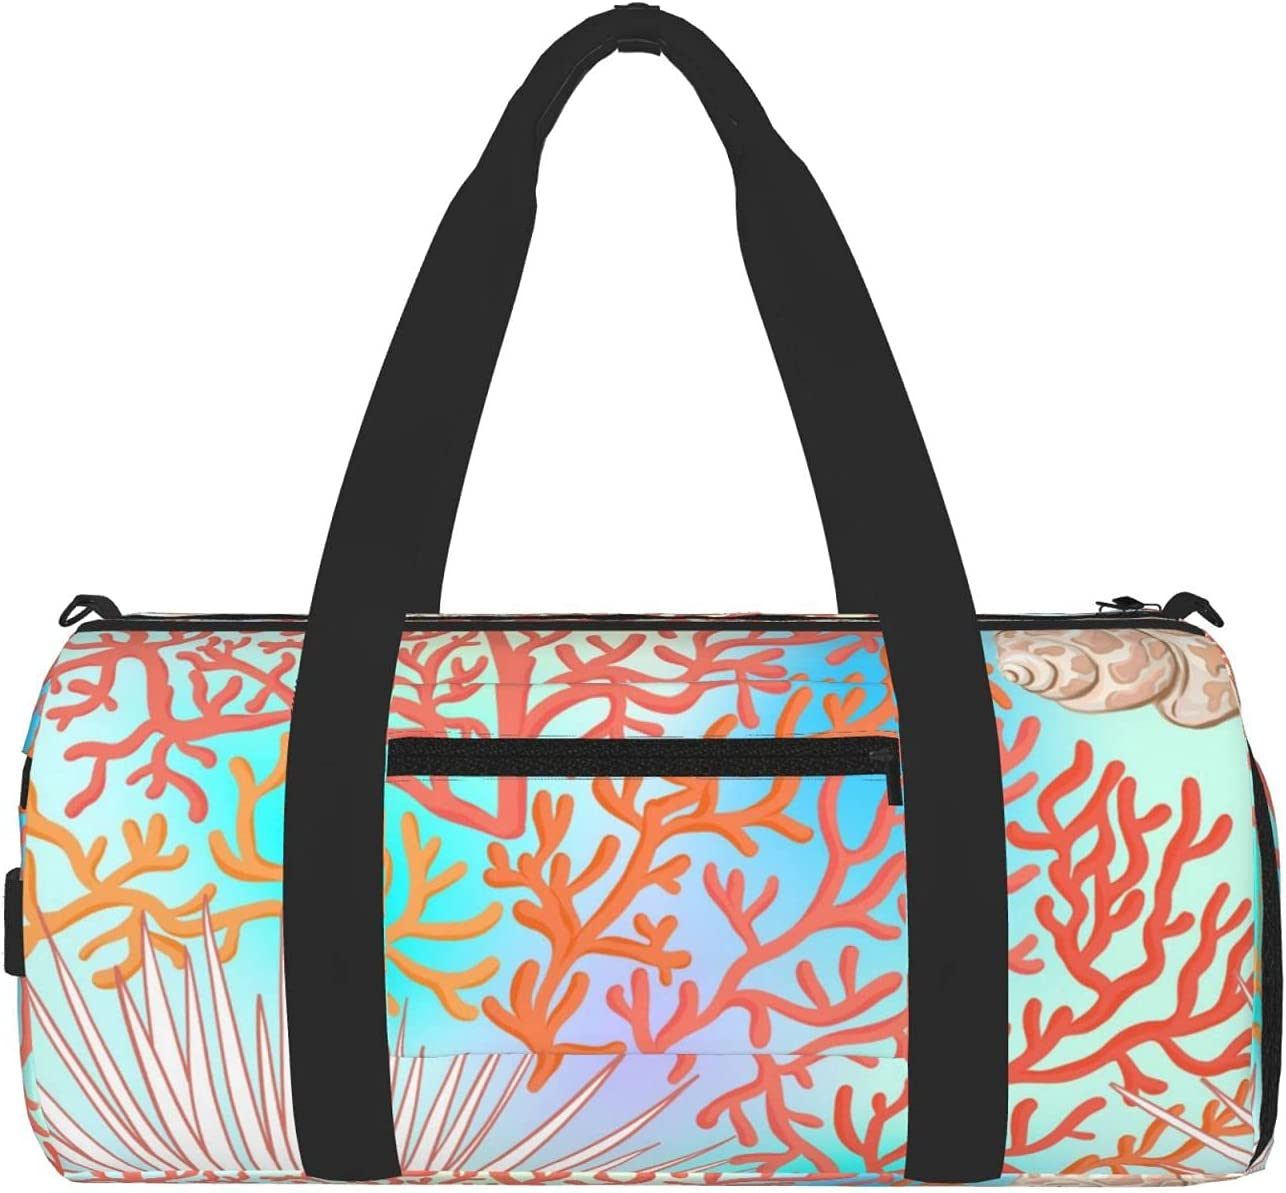 Reindeer Horn Gym Bag For Travel Max 57% OFF Unisex New York Mall Overni